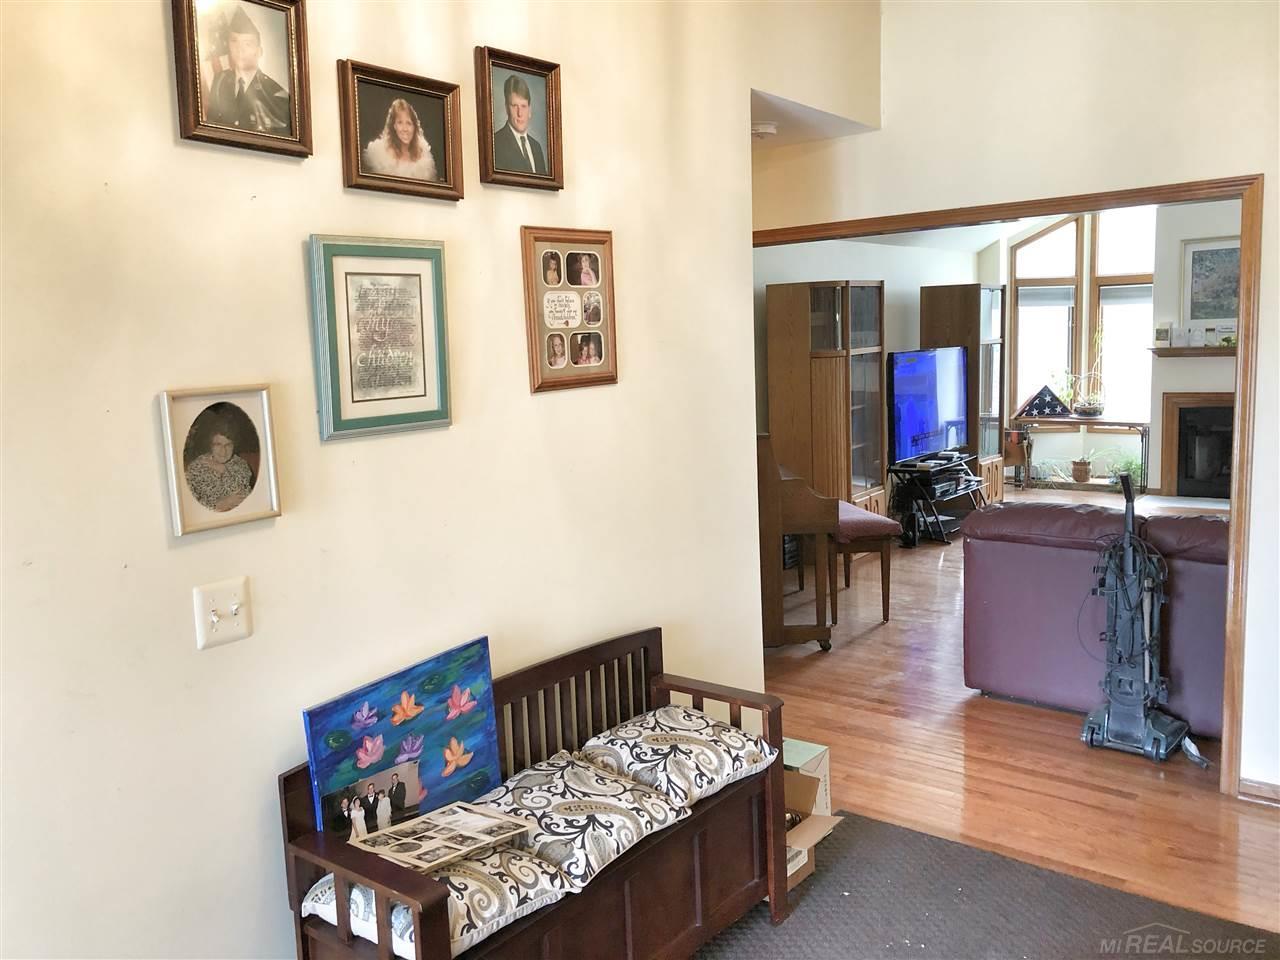 53766 Heritage, New Baltimore, Michigan 48047, 3 Bedrooms Bedrooms, ,3 BathroomsBathrooms,Residential,For Sale,53766 Heritage,1,50038406